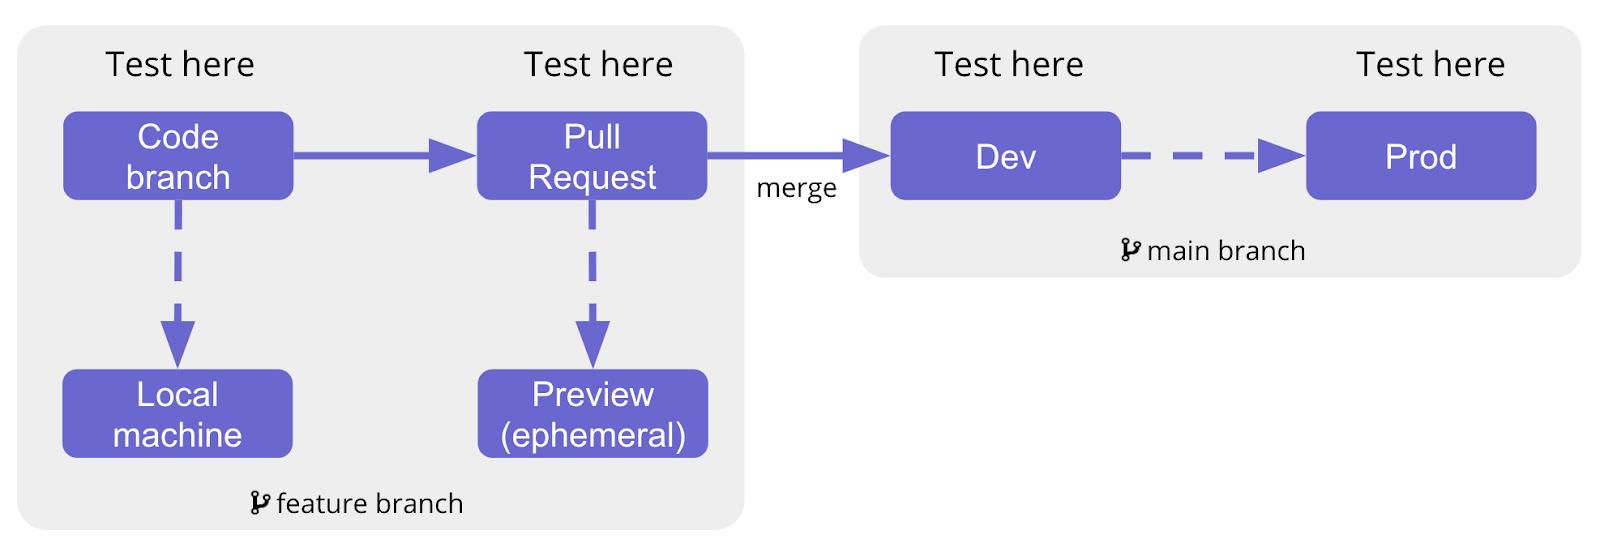 QA testing diagram